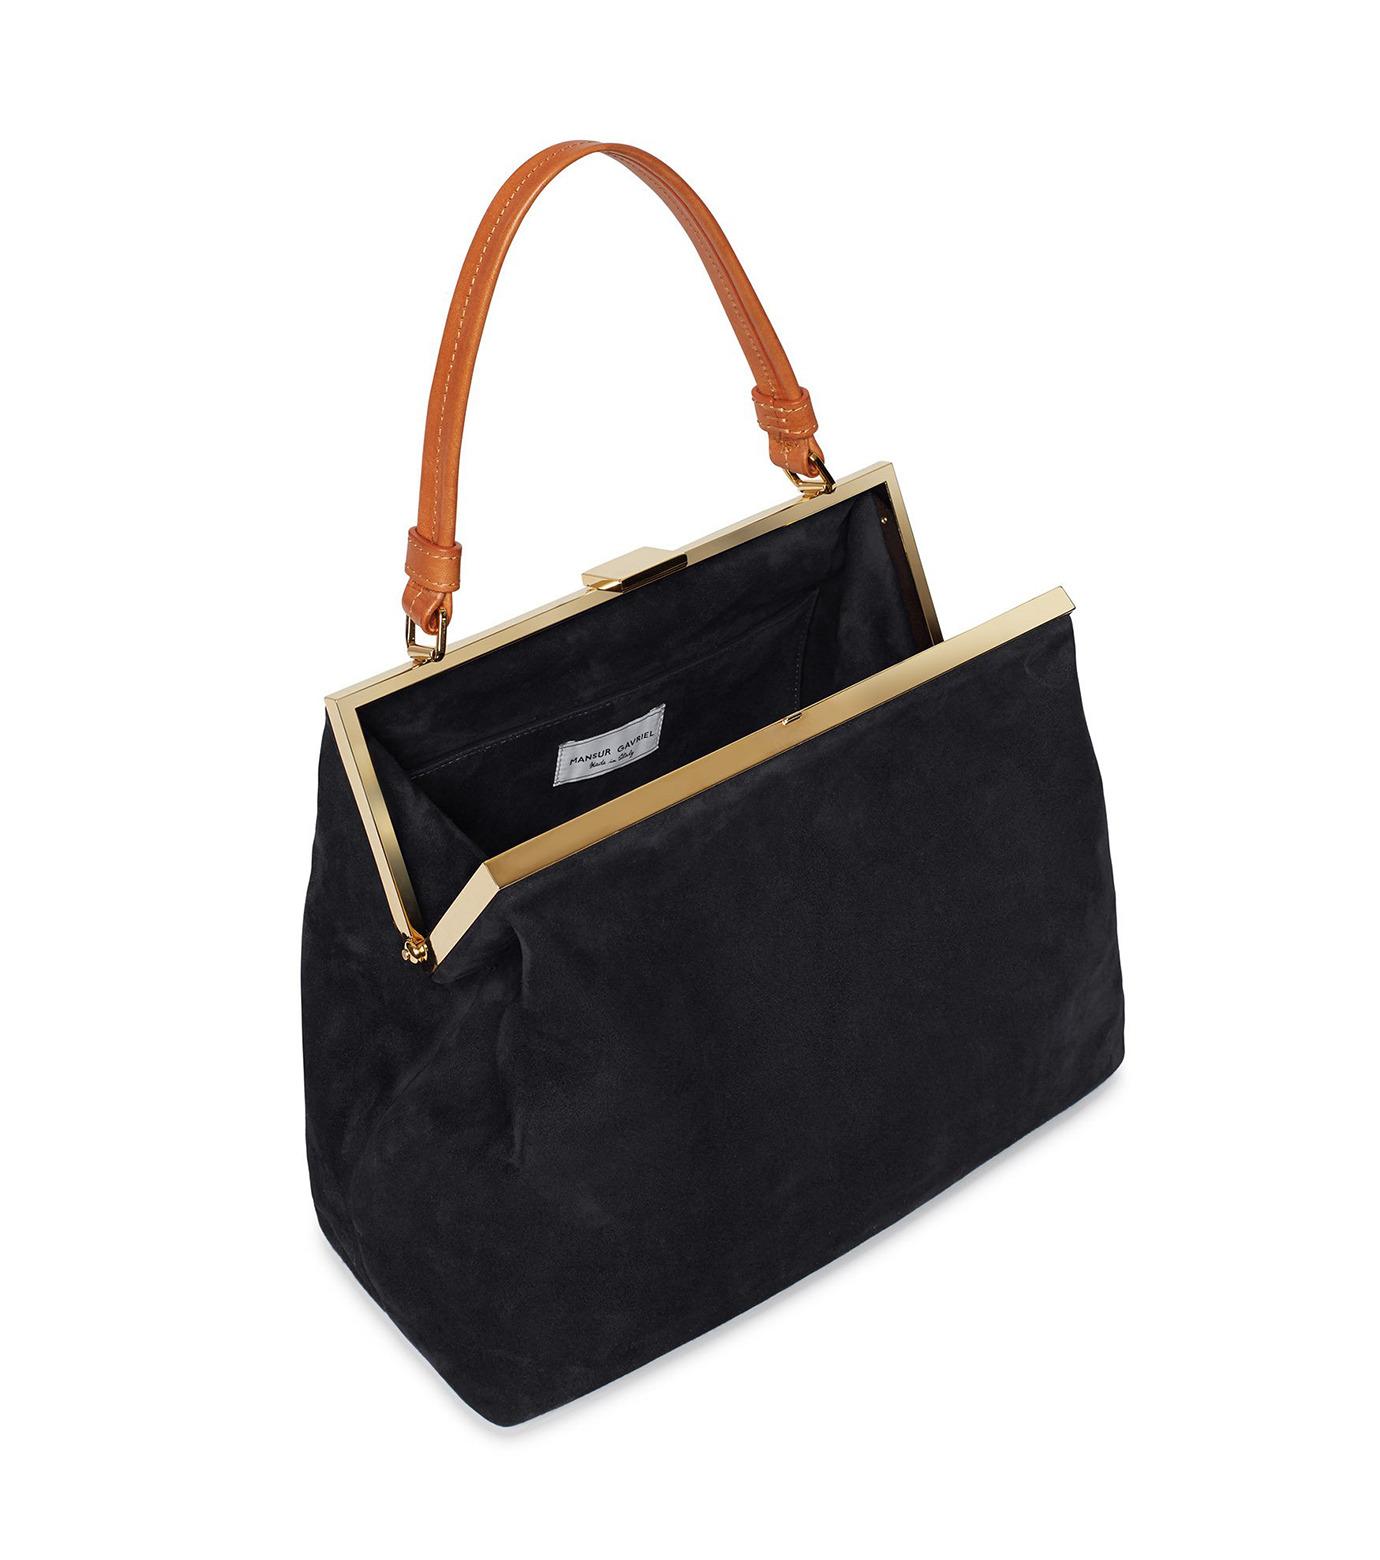 Mansur Gavriel(マンサーガブリエル)のsuede elegant bag-BLACK(ハンドバッグ/hand bag)-HEB024SU-13 拡大詳細画像3